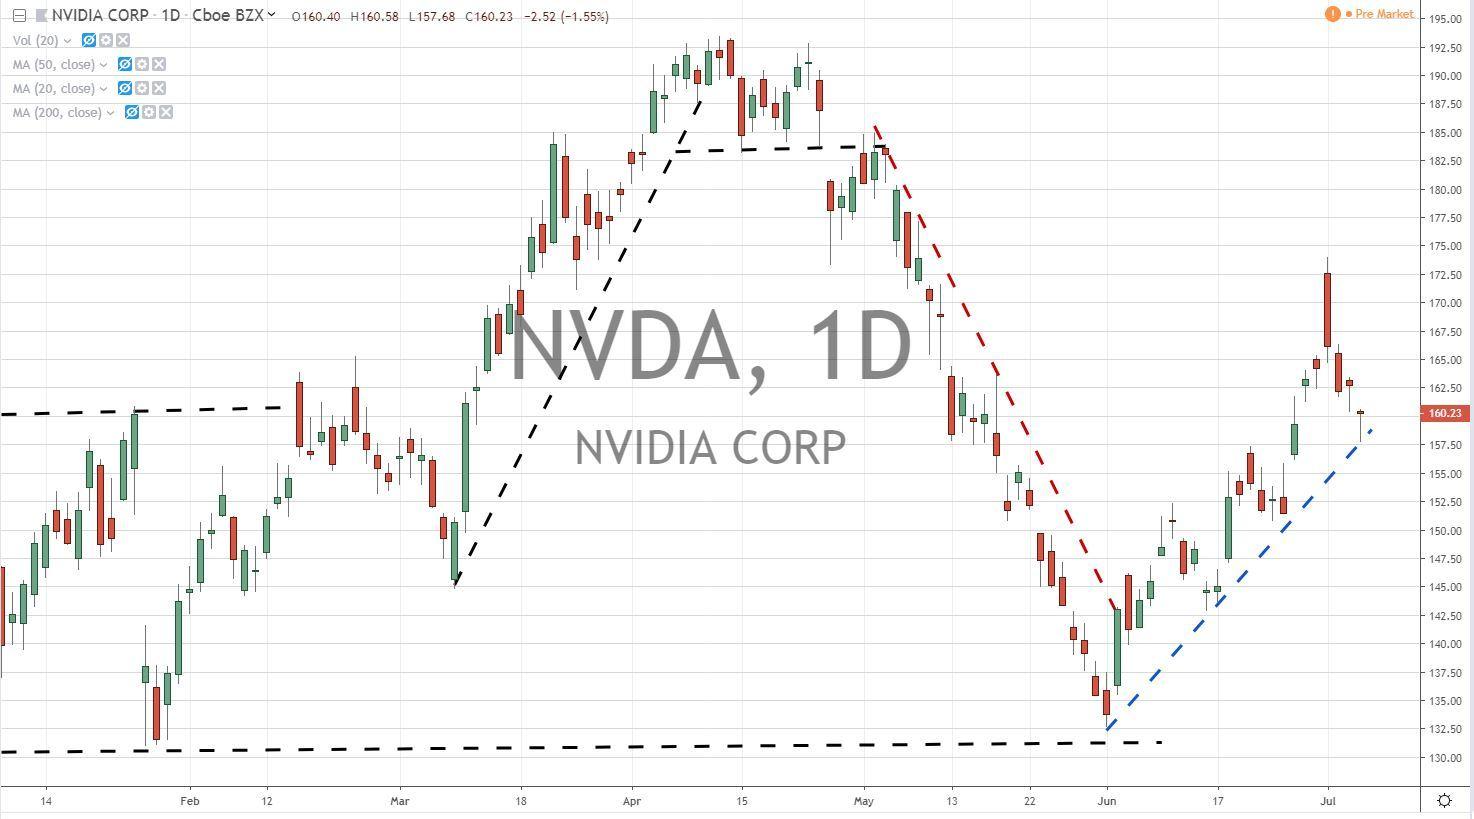 Nvidia Corp NVDA Stock Chart 7-8-19